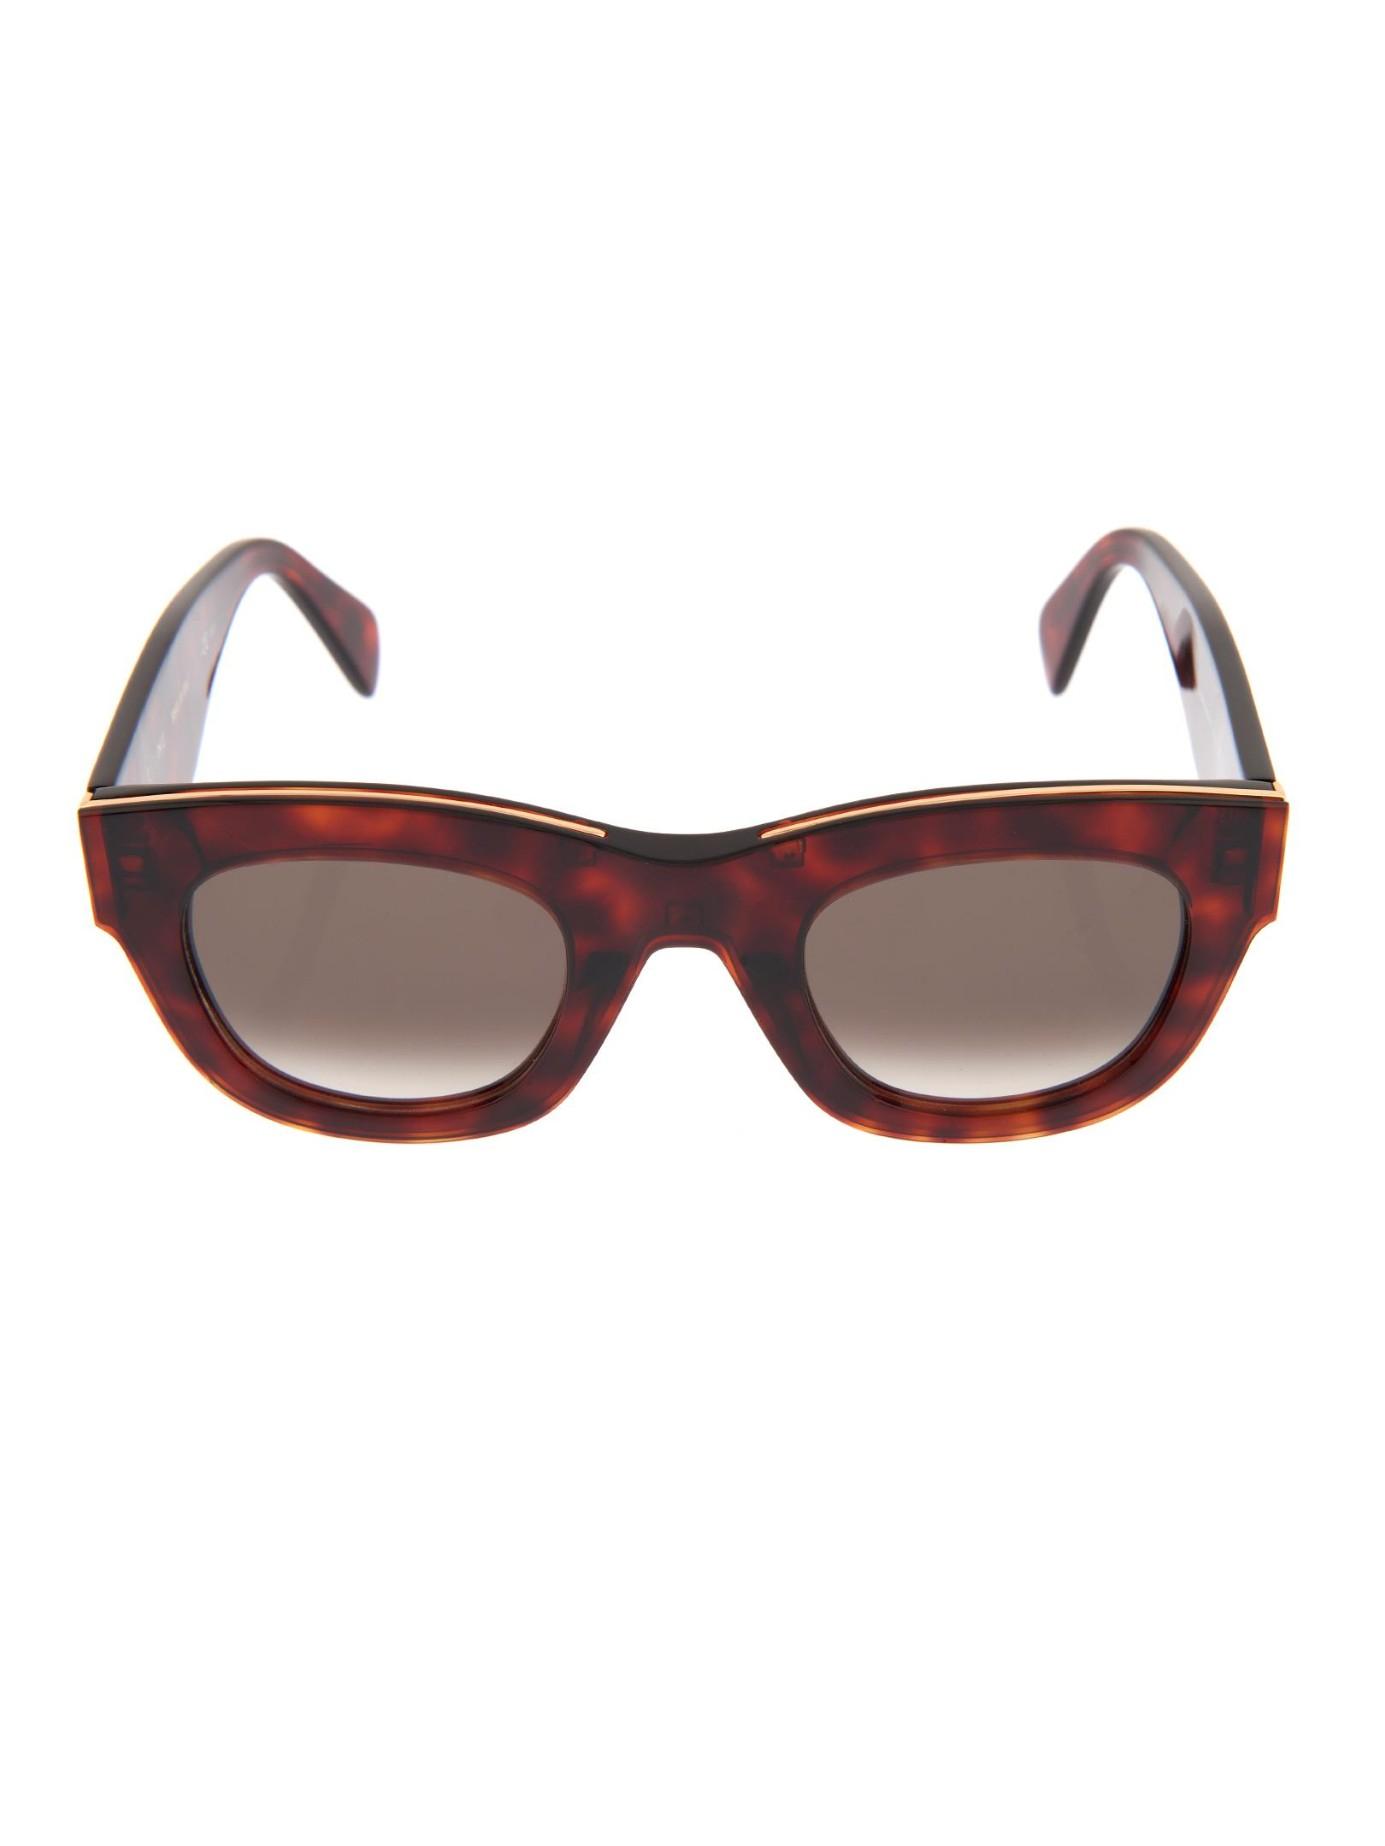 5237dc621a83 Lyst - Céline D-Frame Acetate Sunglasses in Purple